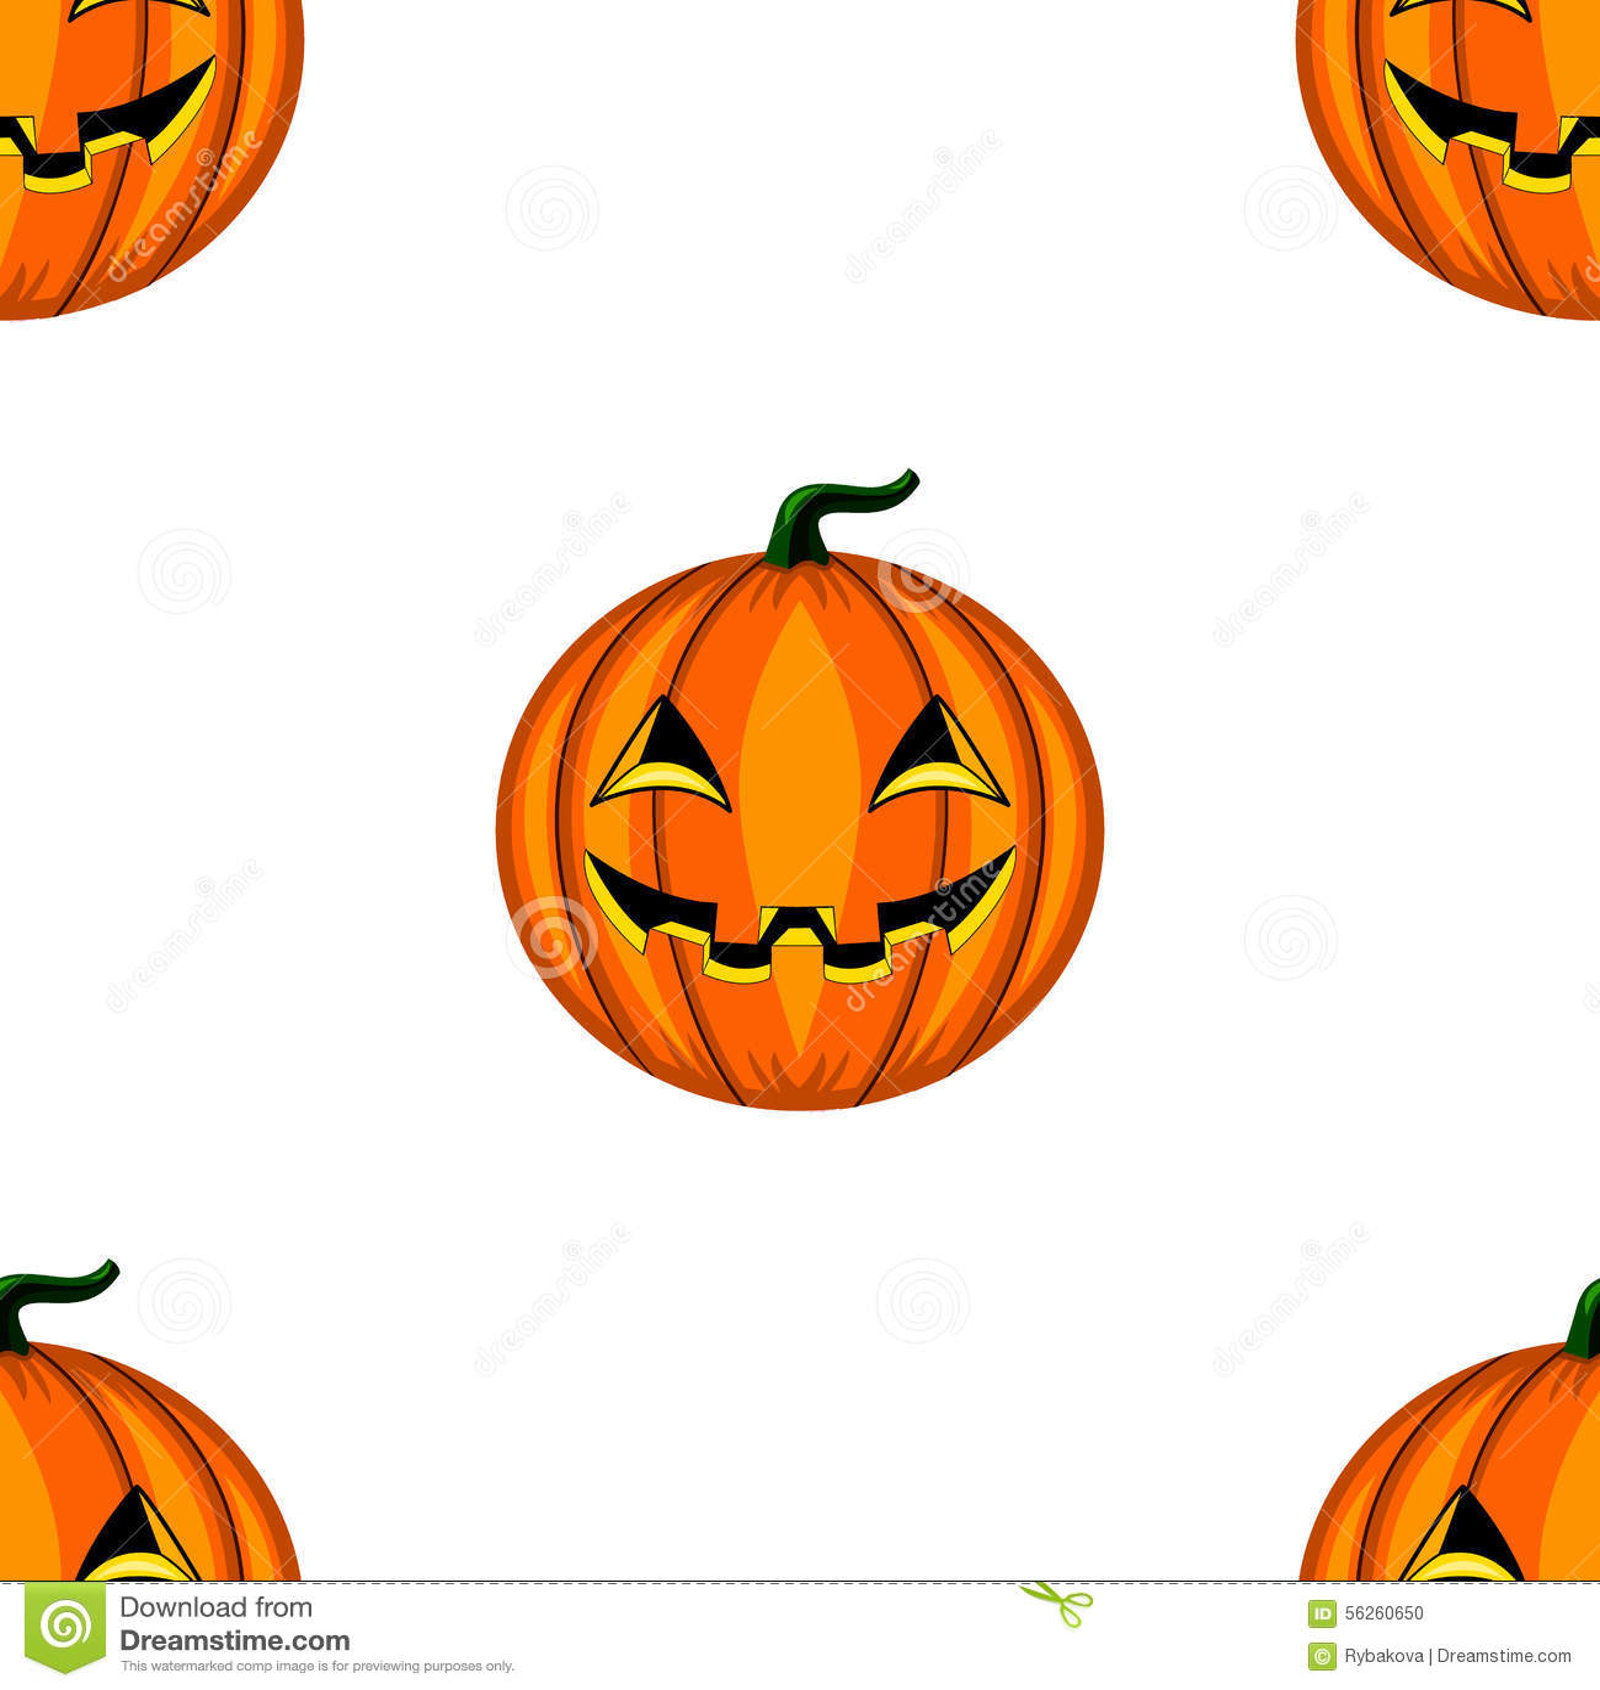 how to make halloween pumpkin head